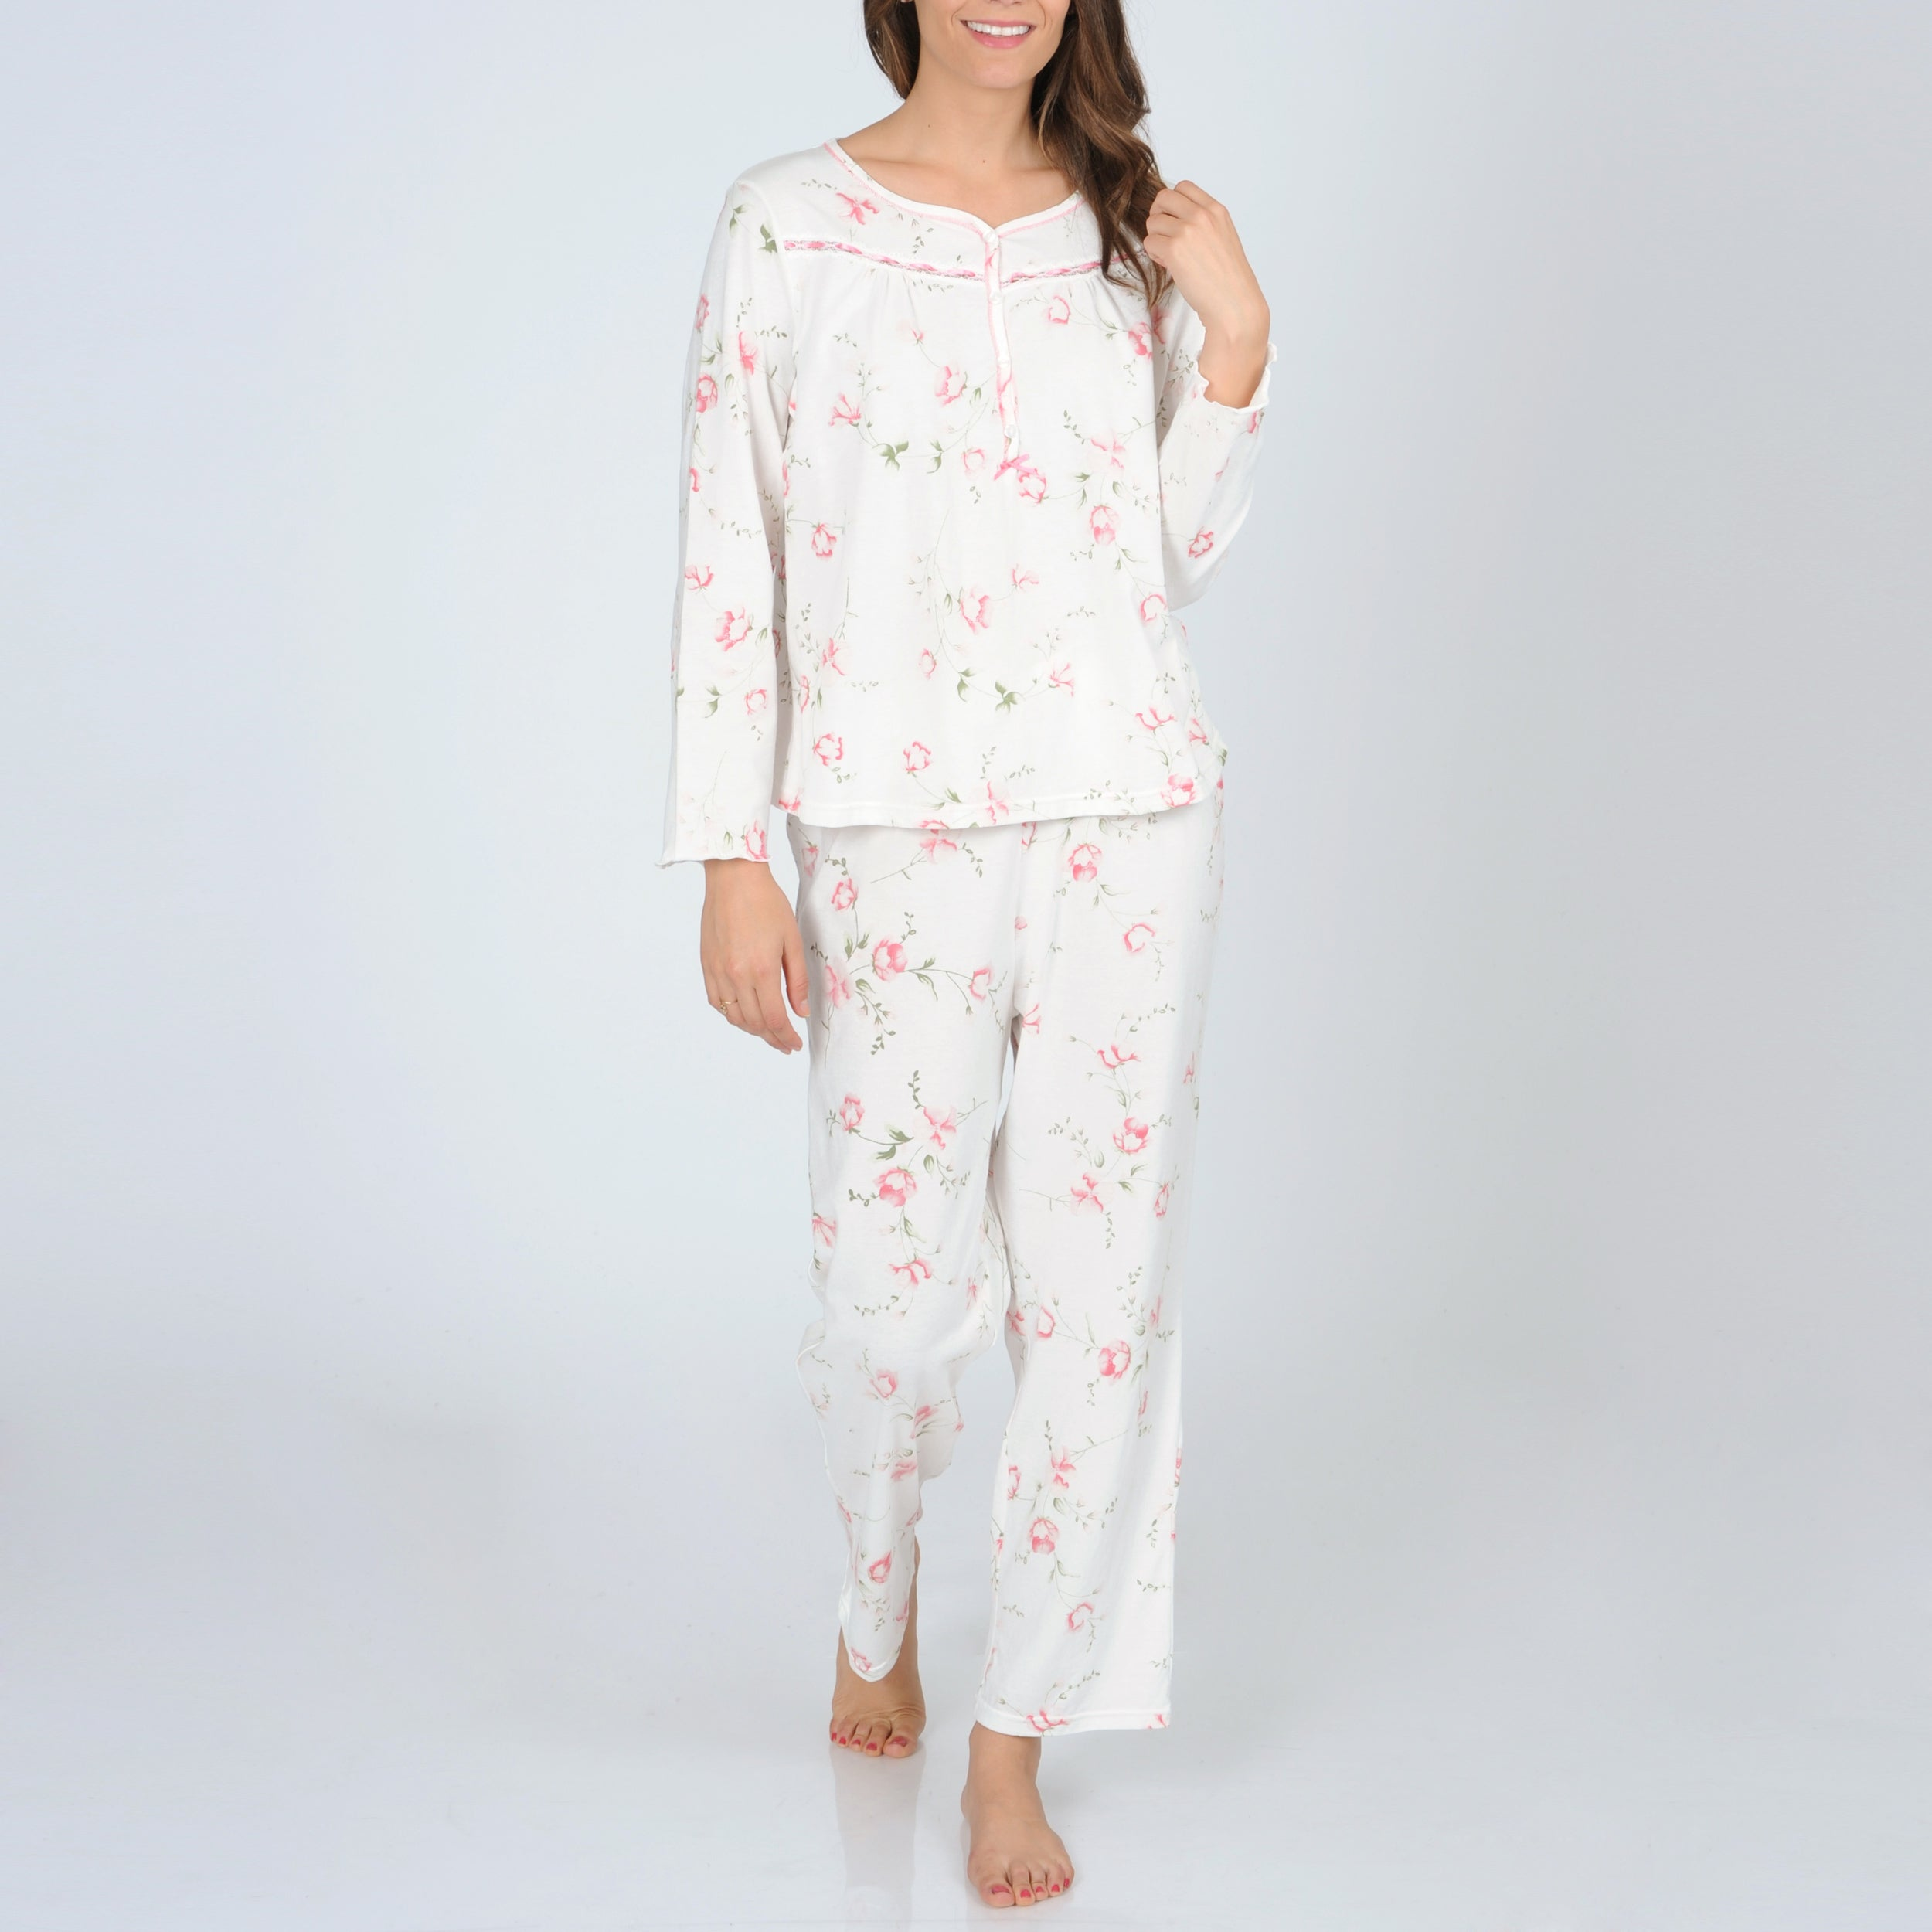 bcaee47bcd Buy Pajama Sets La Cera Pajamas   Robes Online at Overstock